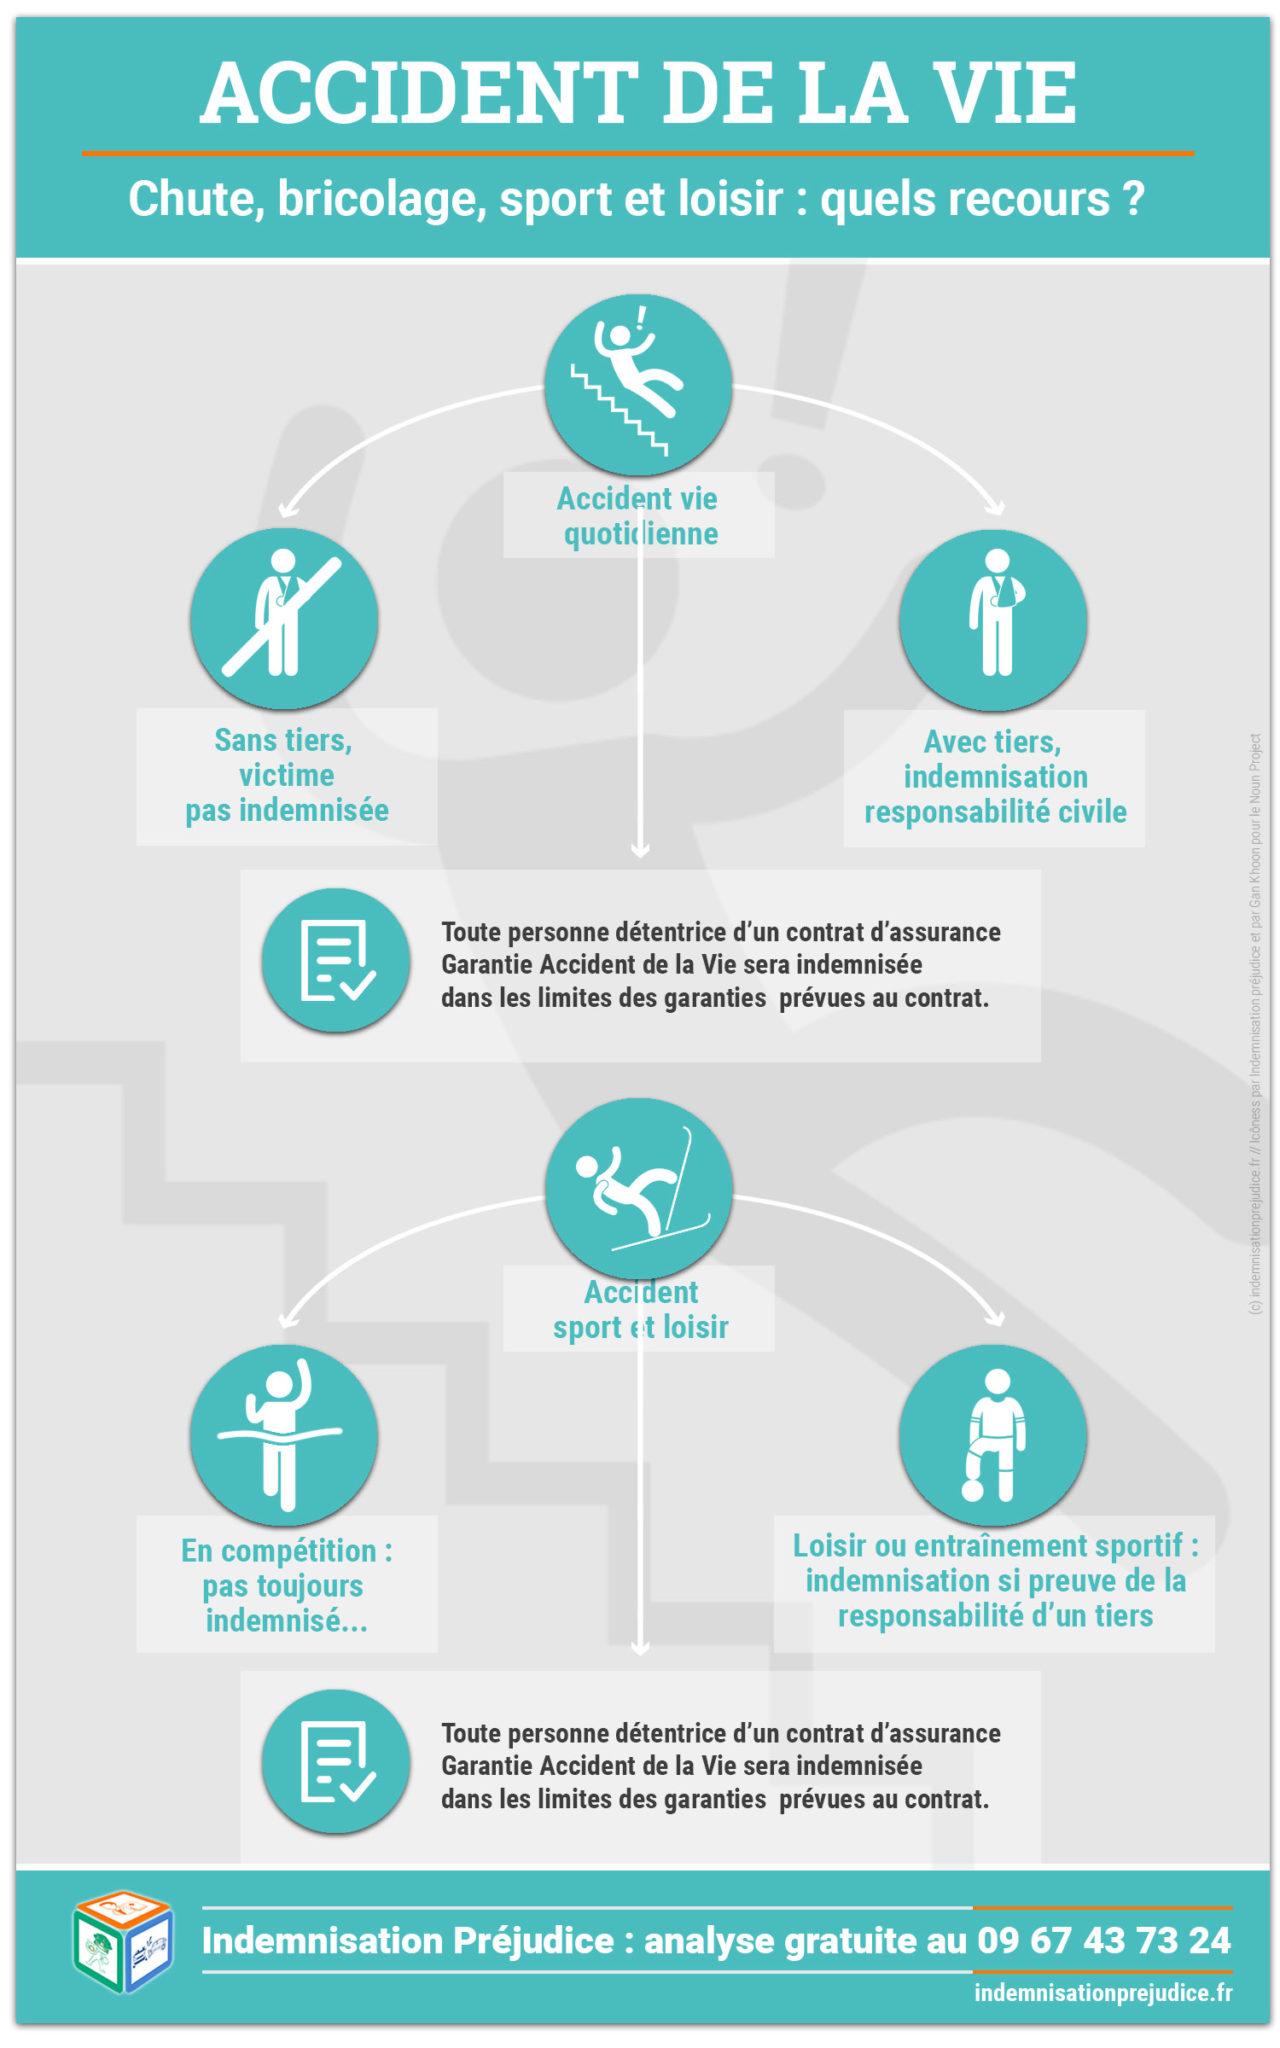 indemnisation préjudice-accident de la vie-infographie